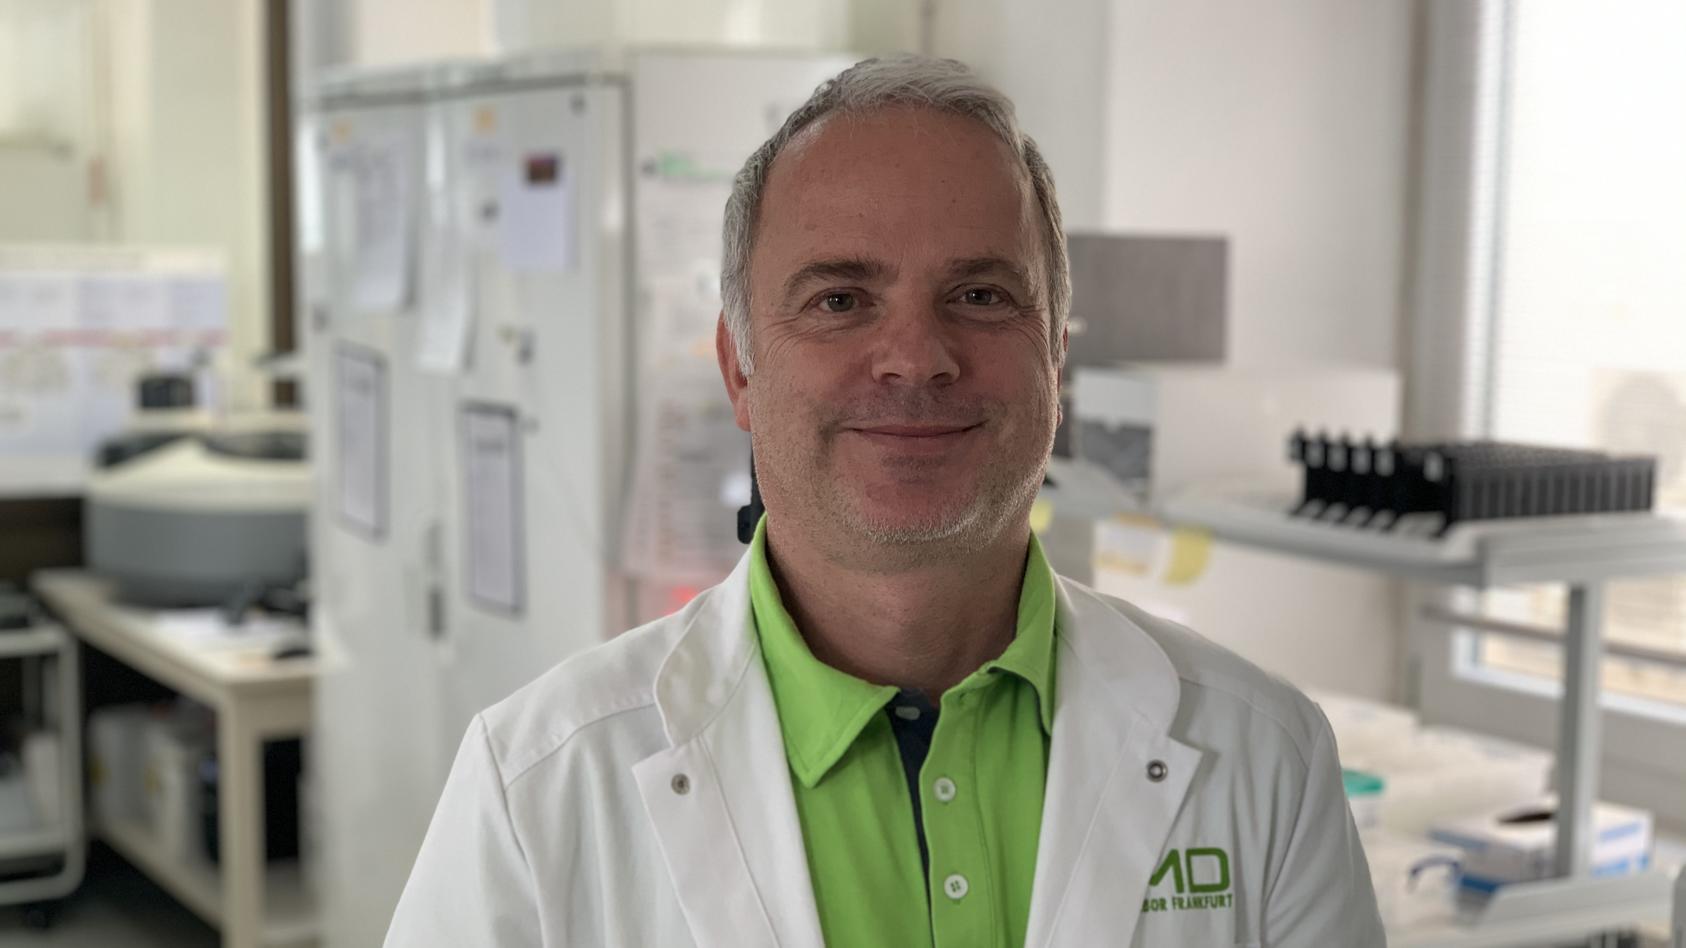 Dr. Martin Stürmer ist Virologe am Klinikum der Johann-Wolfgang-Goethe Universität.